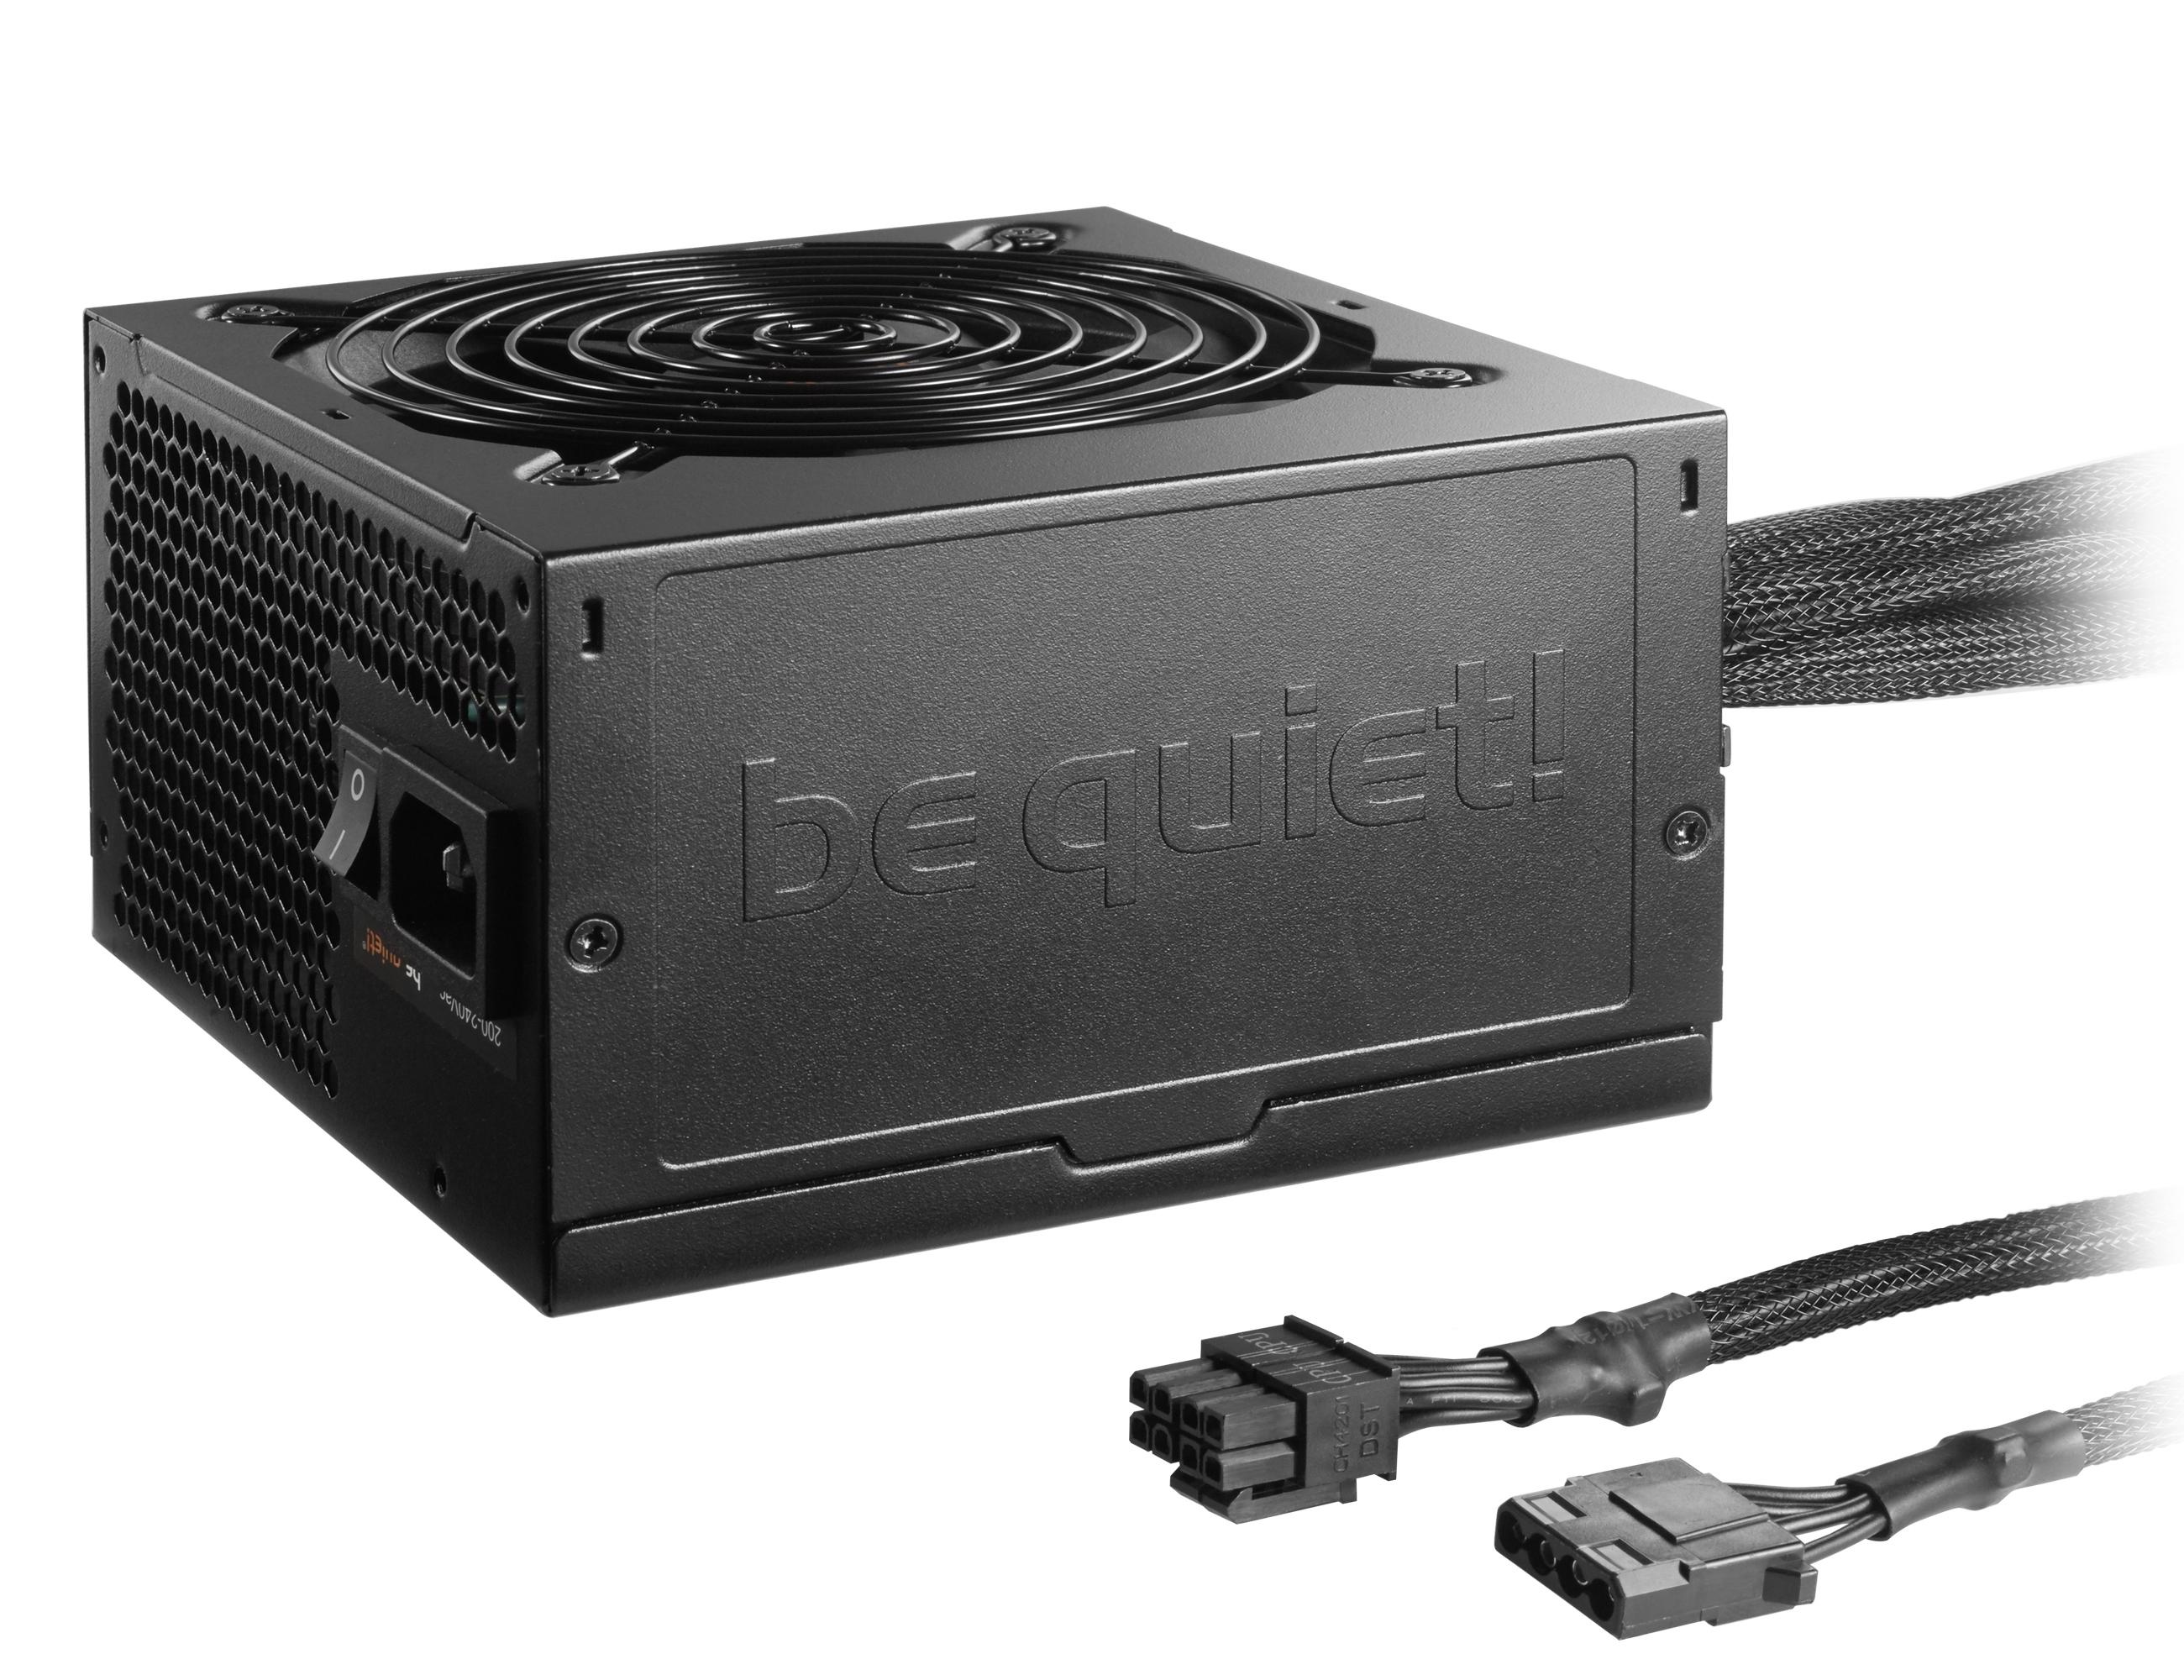 be quiet! System Power B9 600W, 80+ Bronze, ErP, Energy Star 6.1 APFC, Sleeved, 2xPCI-Ex, 6xSATA, 2xPATA, DC-DC , Black// SB9-600W, bulk, 10 per doos